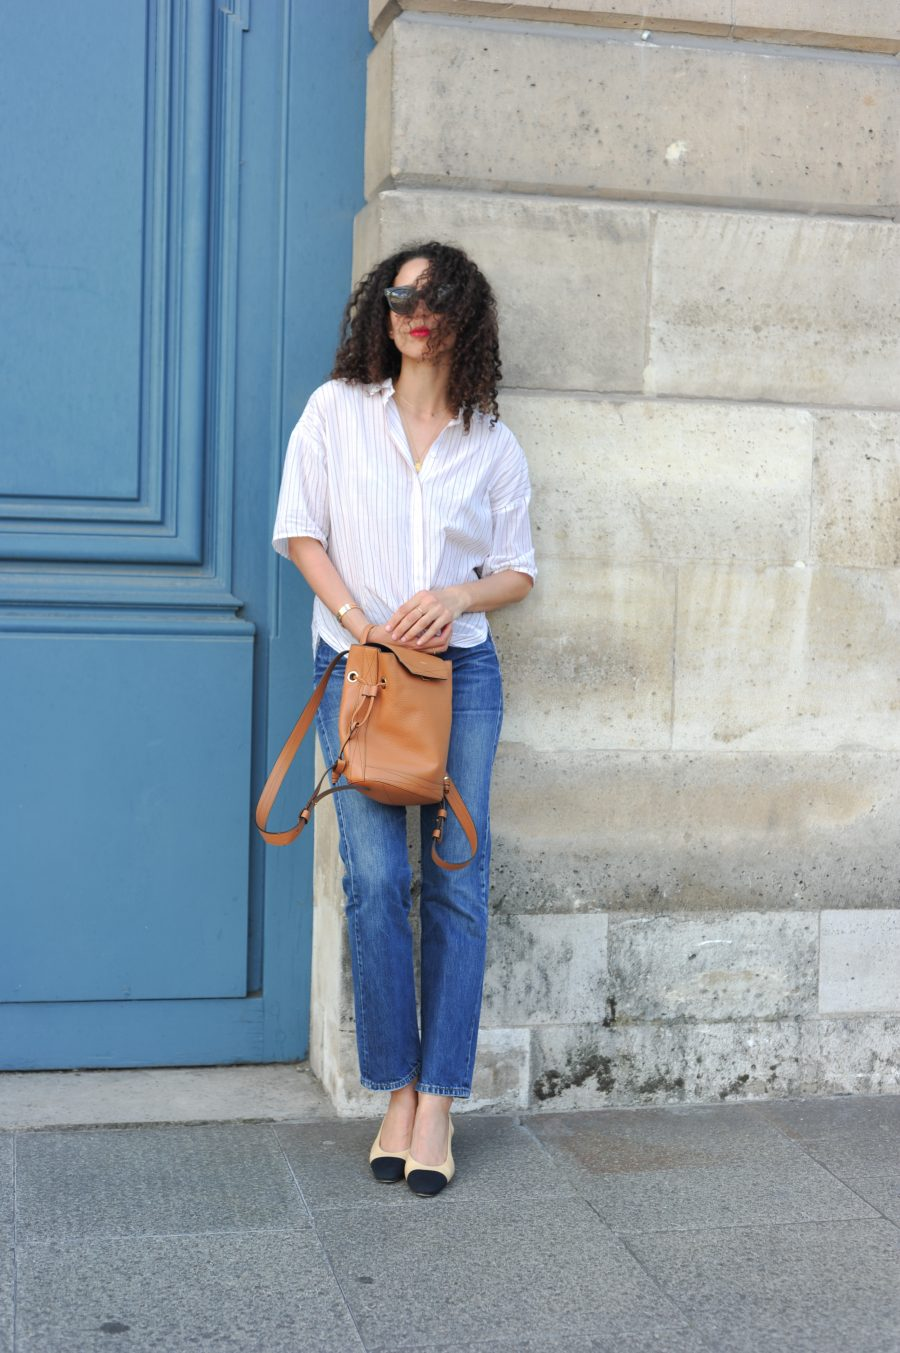 chemise-chemins-blancs-3